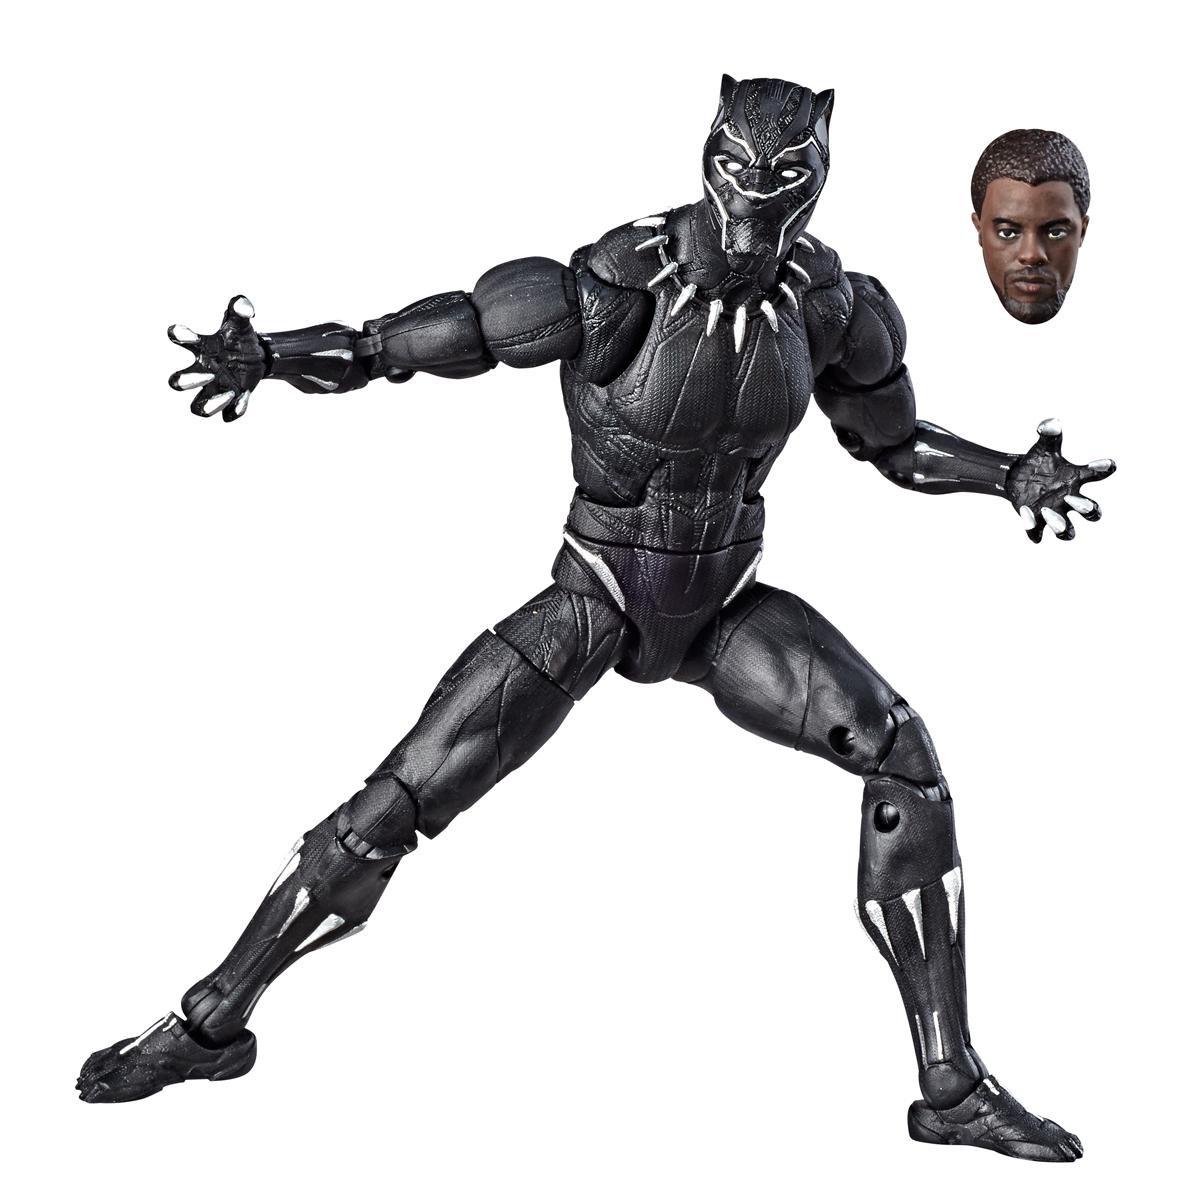 Marvel Legends Series Avengers Infinity War 6-inch Black Panther Figure